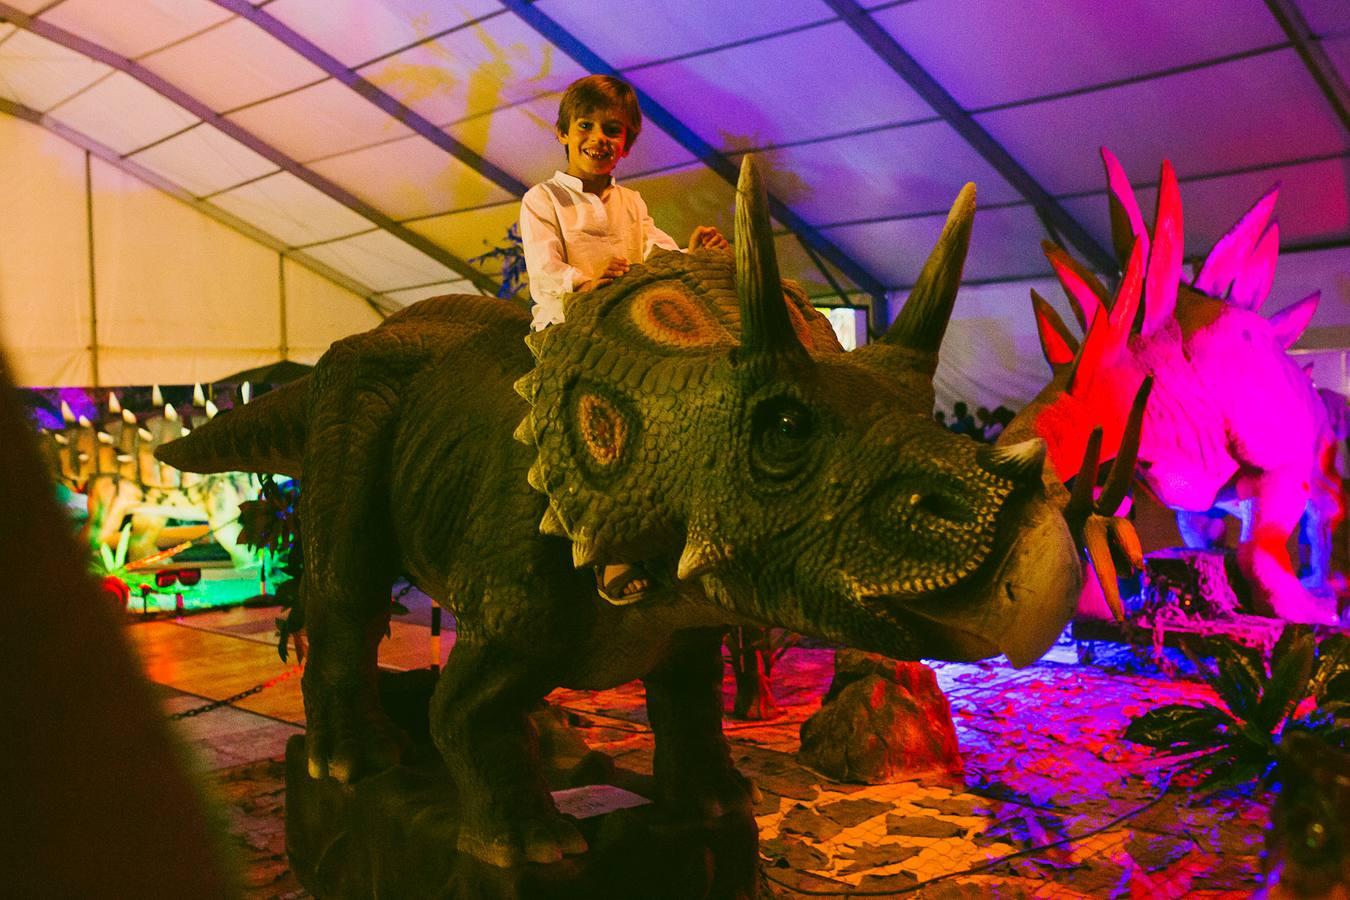 Dinosaurs Tour, la mayor exposición de dinosaurios animatrónicos a tamaño real, llega a Santander